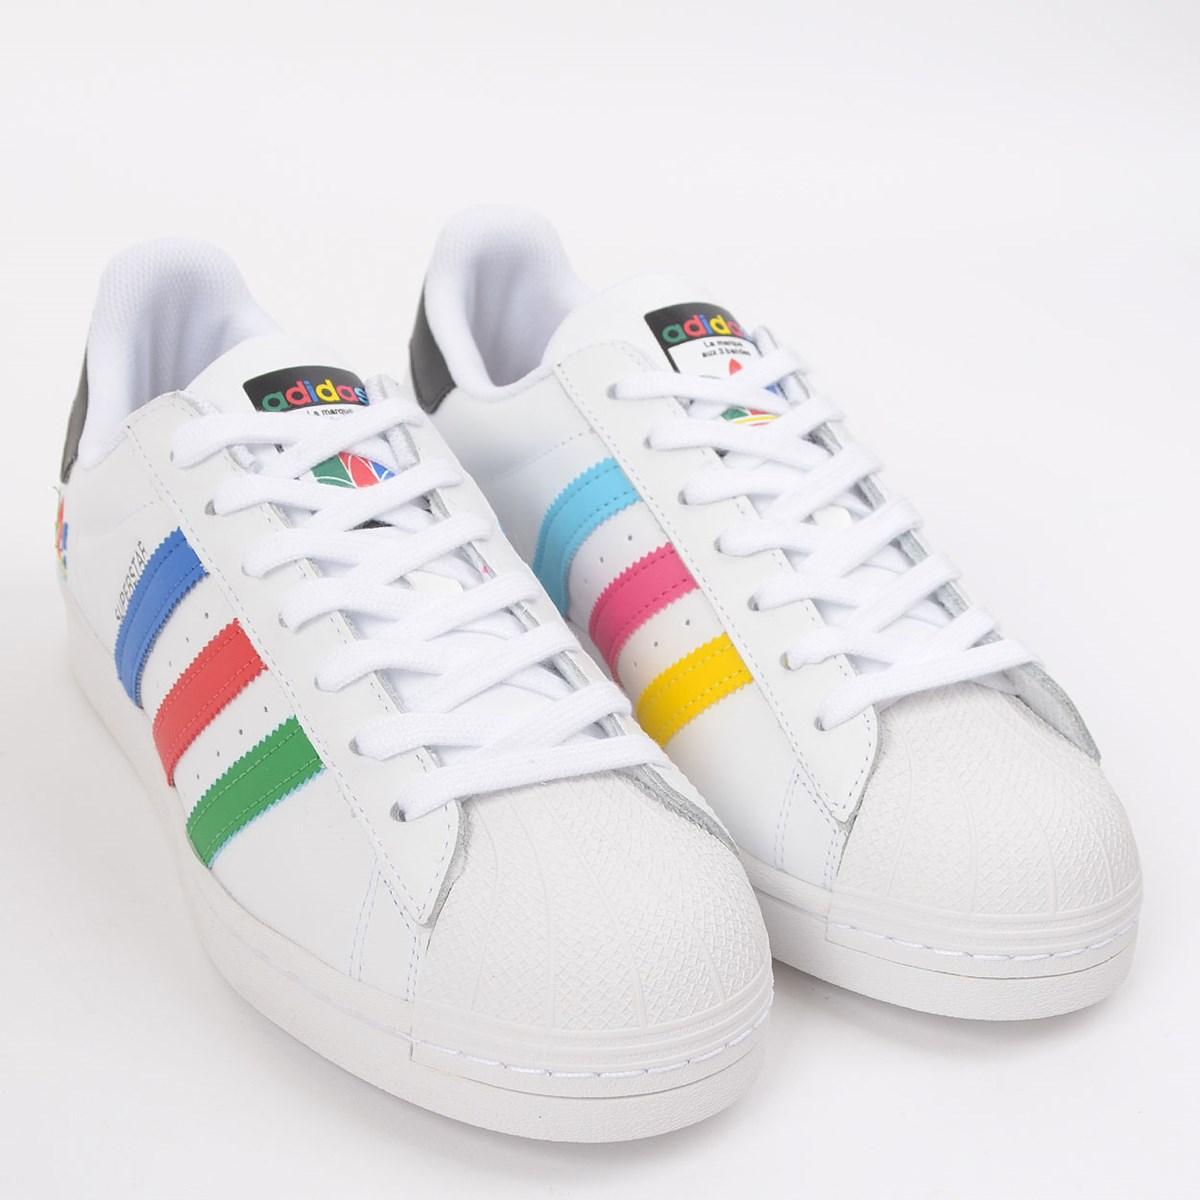 Tênis adidas Superstar Ftwr White Green FW5236